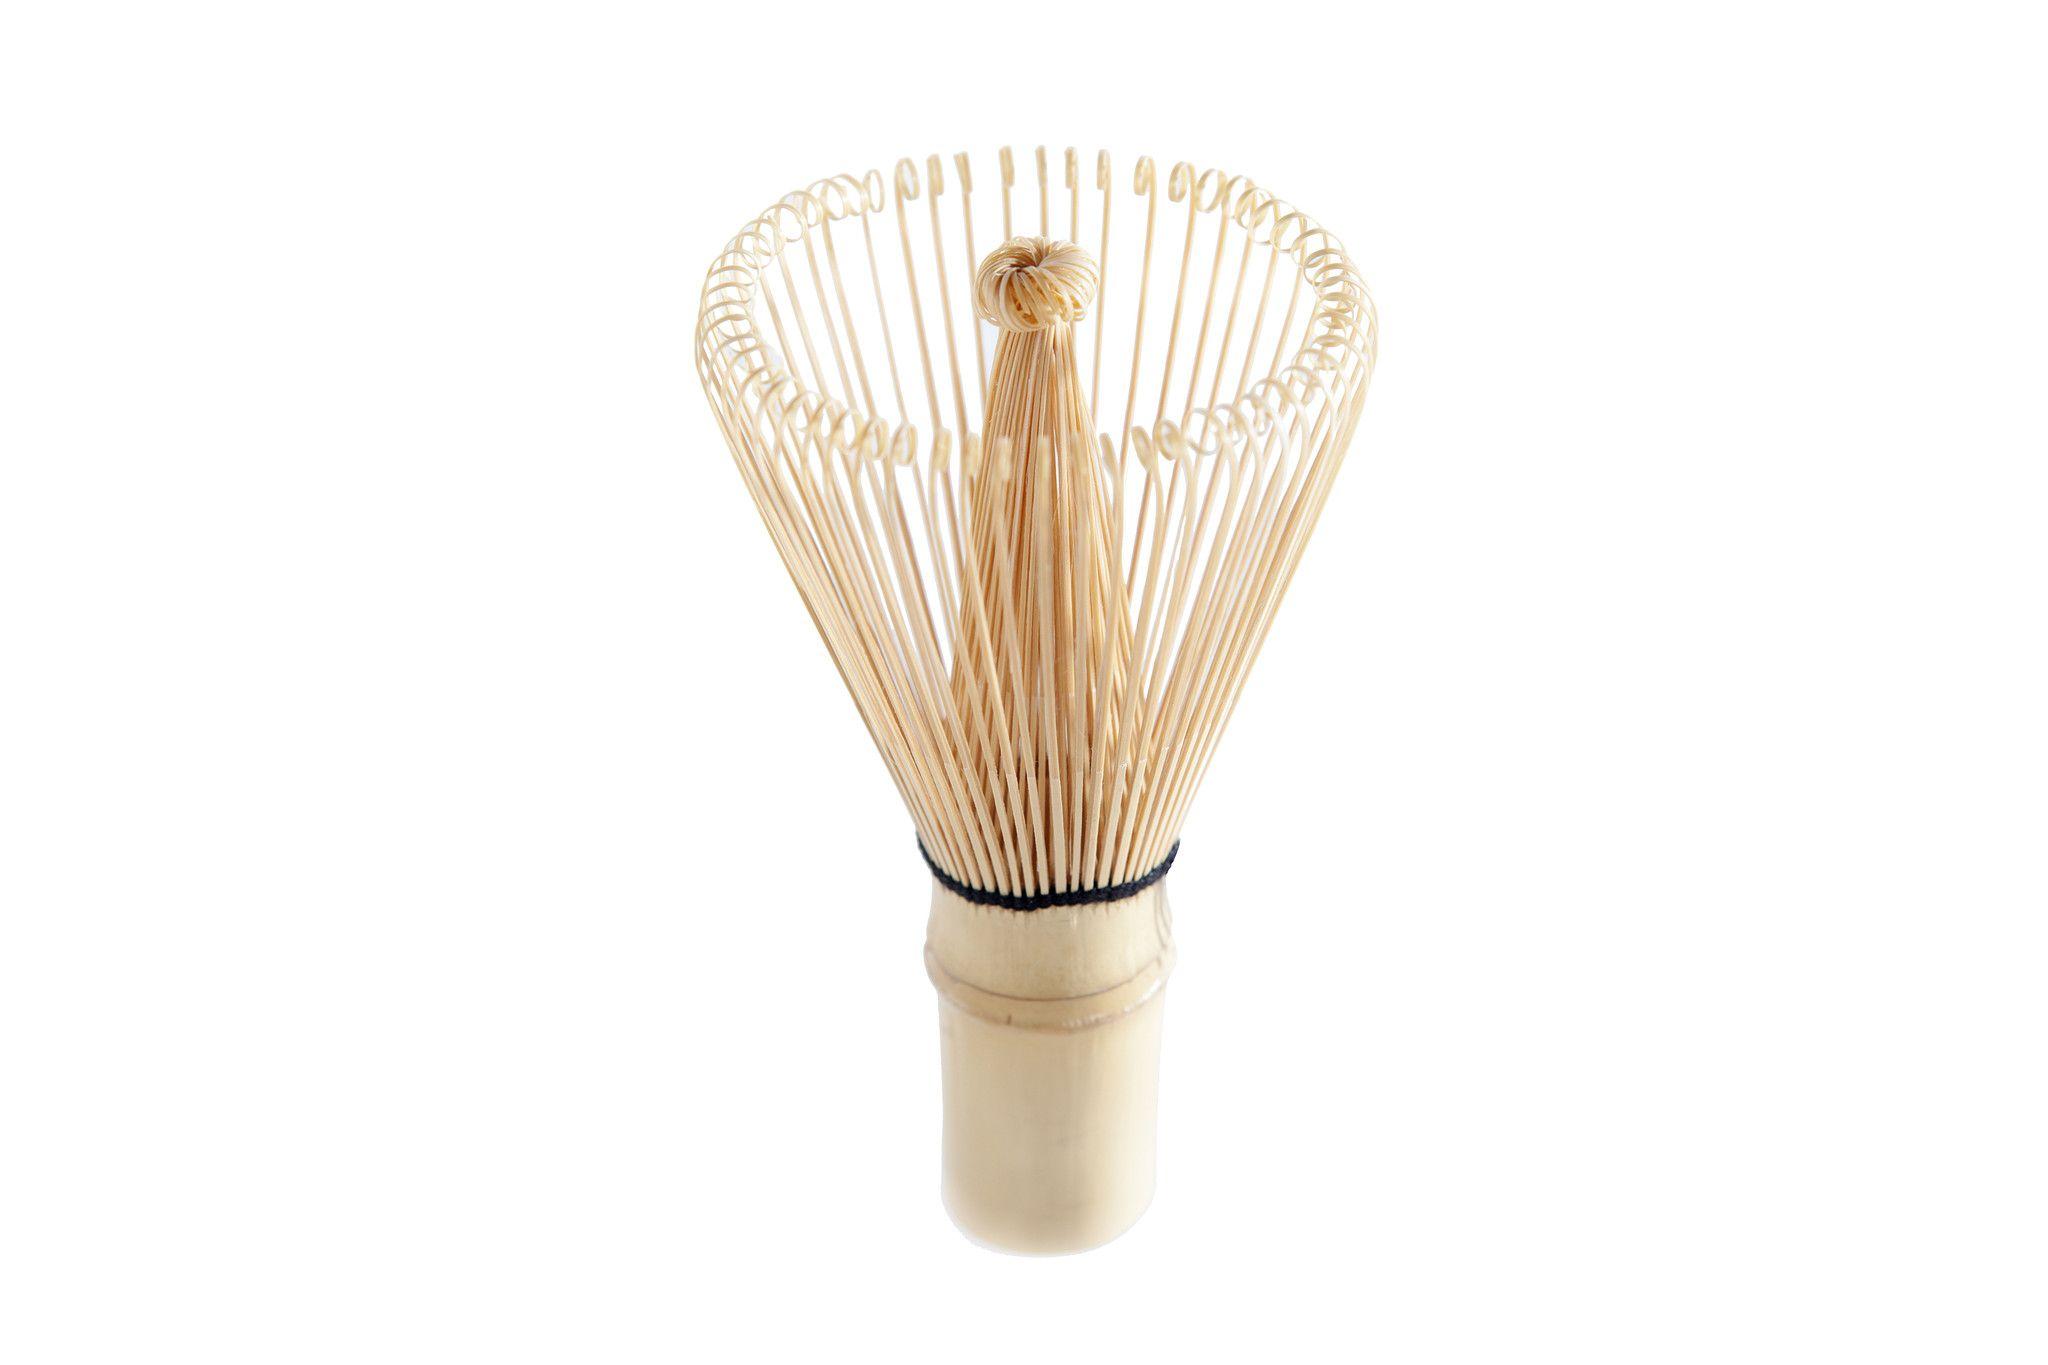 Traditional Matcha Whisk Matcha whisk, Matcha, Bamboo